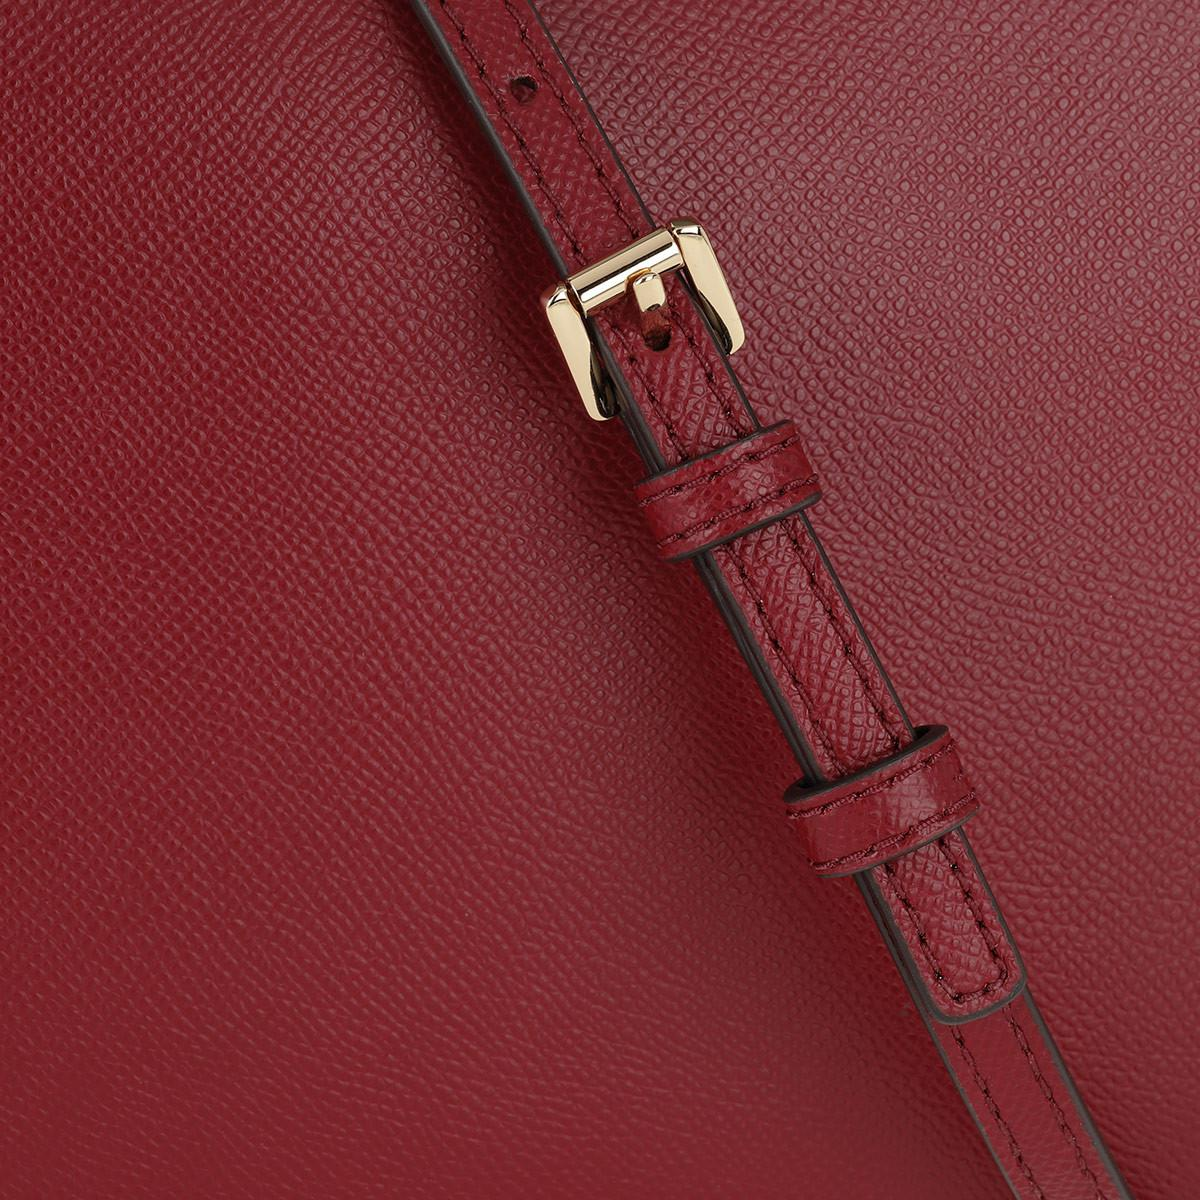 Michael Kors Leather Lg Ew Crossbody Bag Maroon in Red